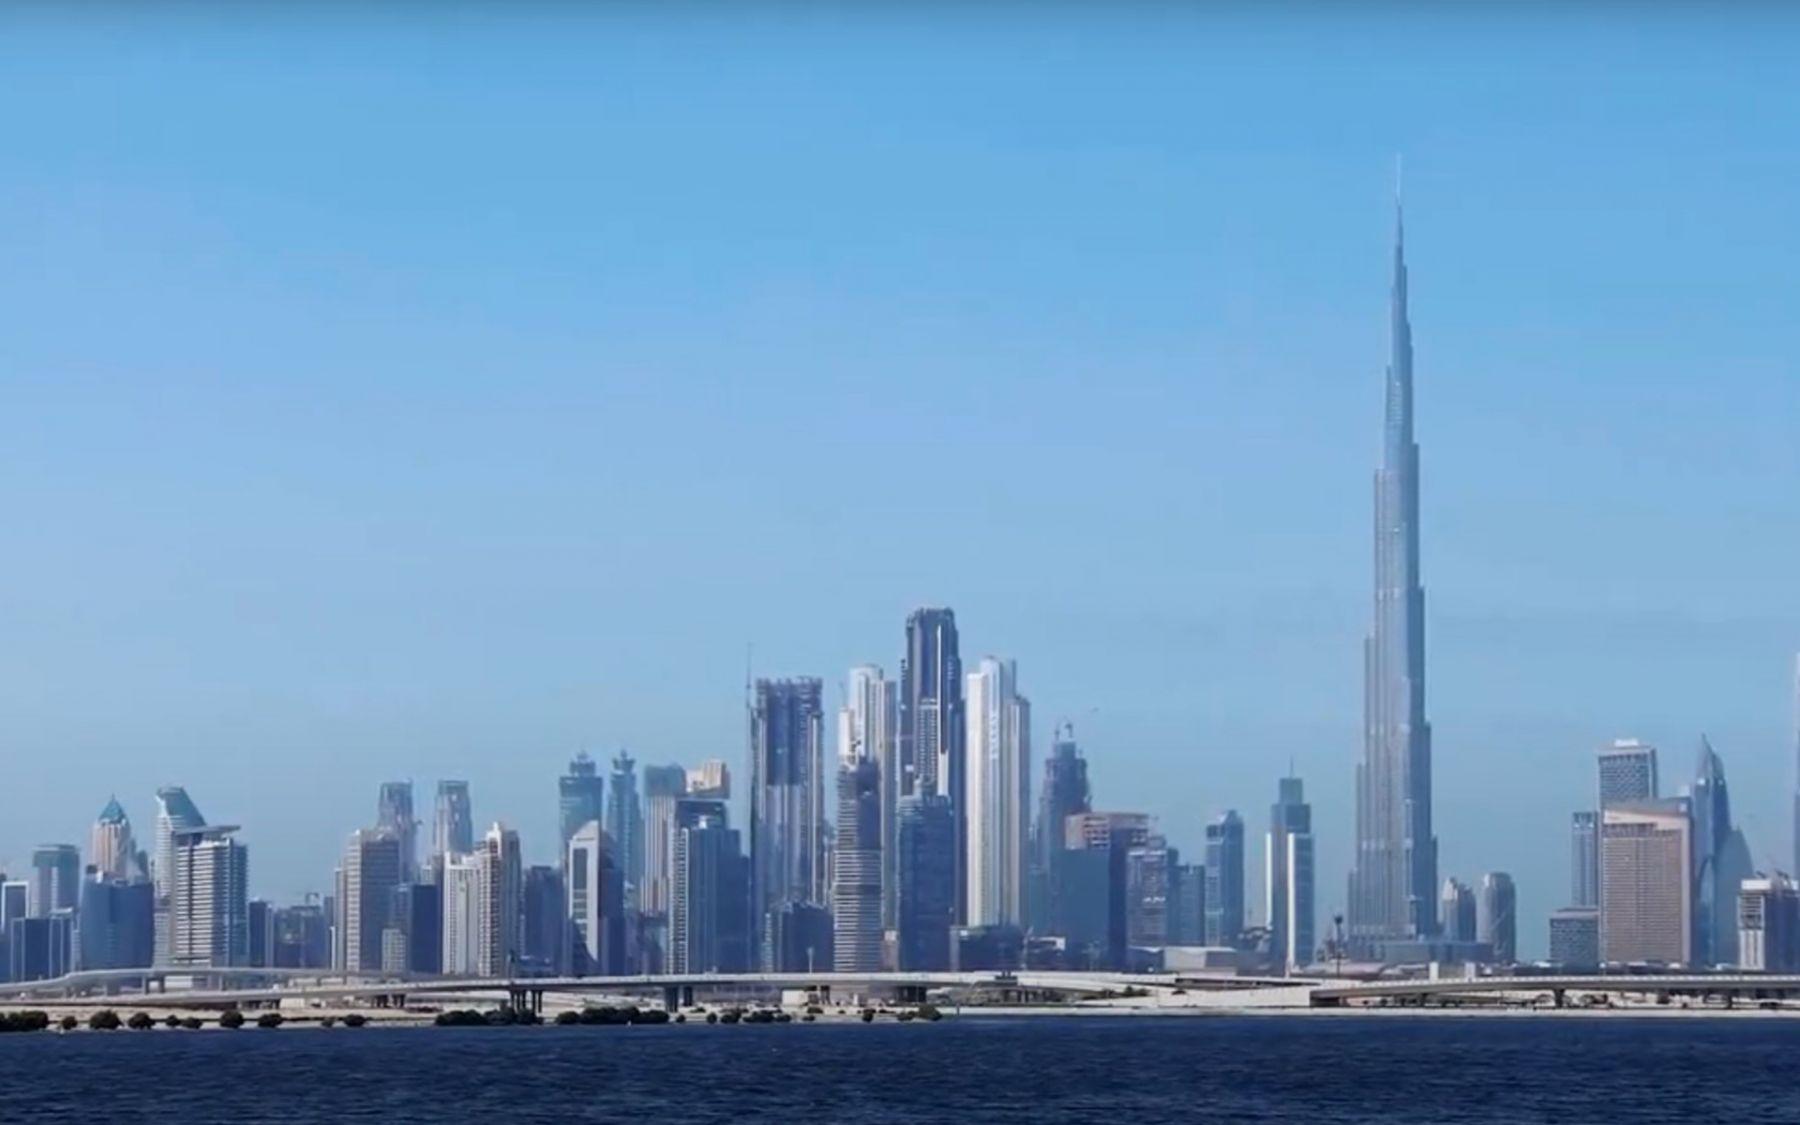 Dubai Design Week 2020 | Save the Date 9 - 14 November